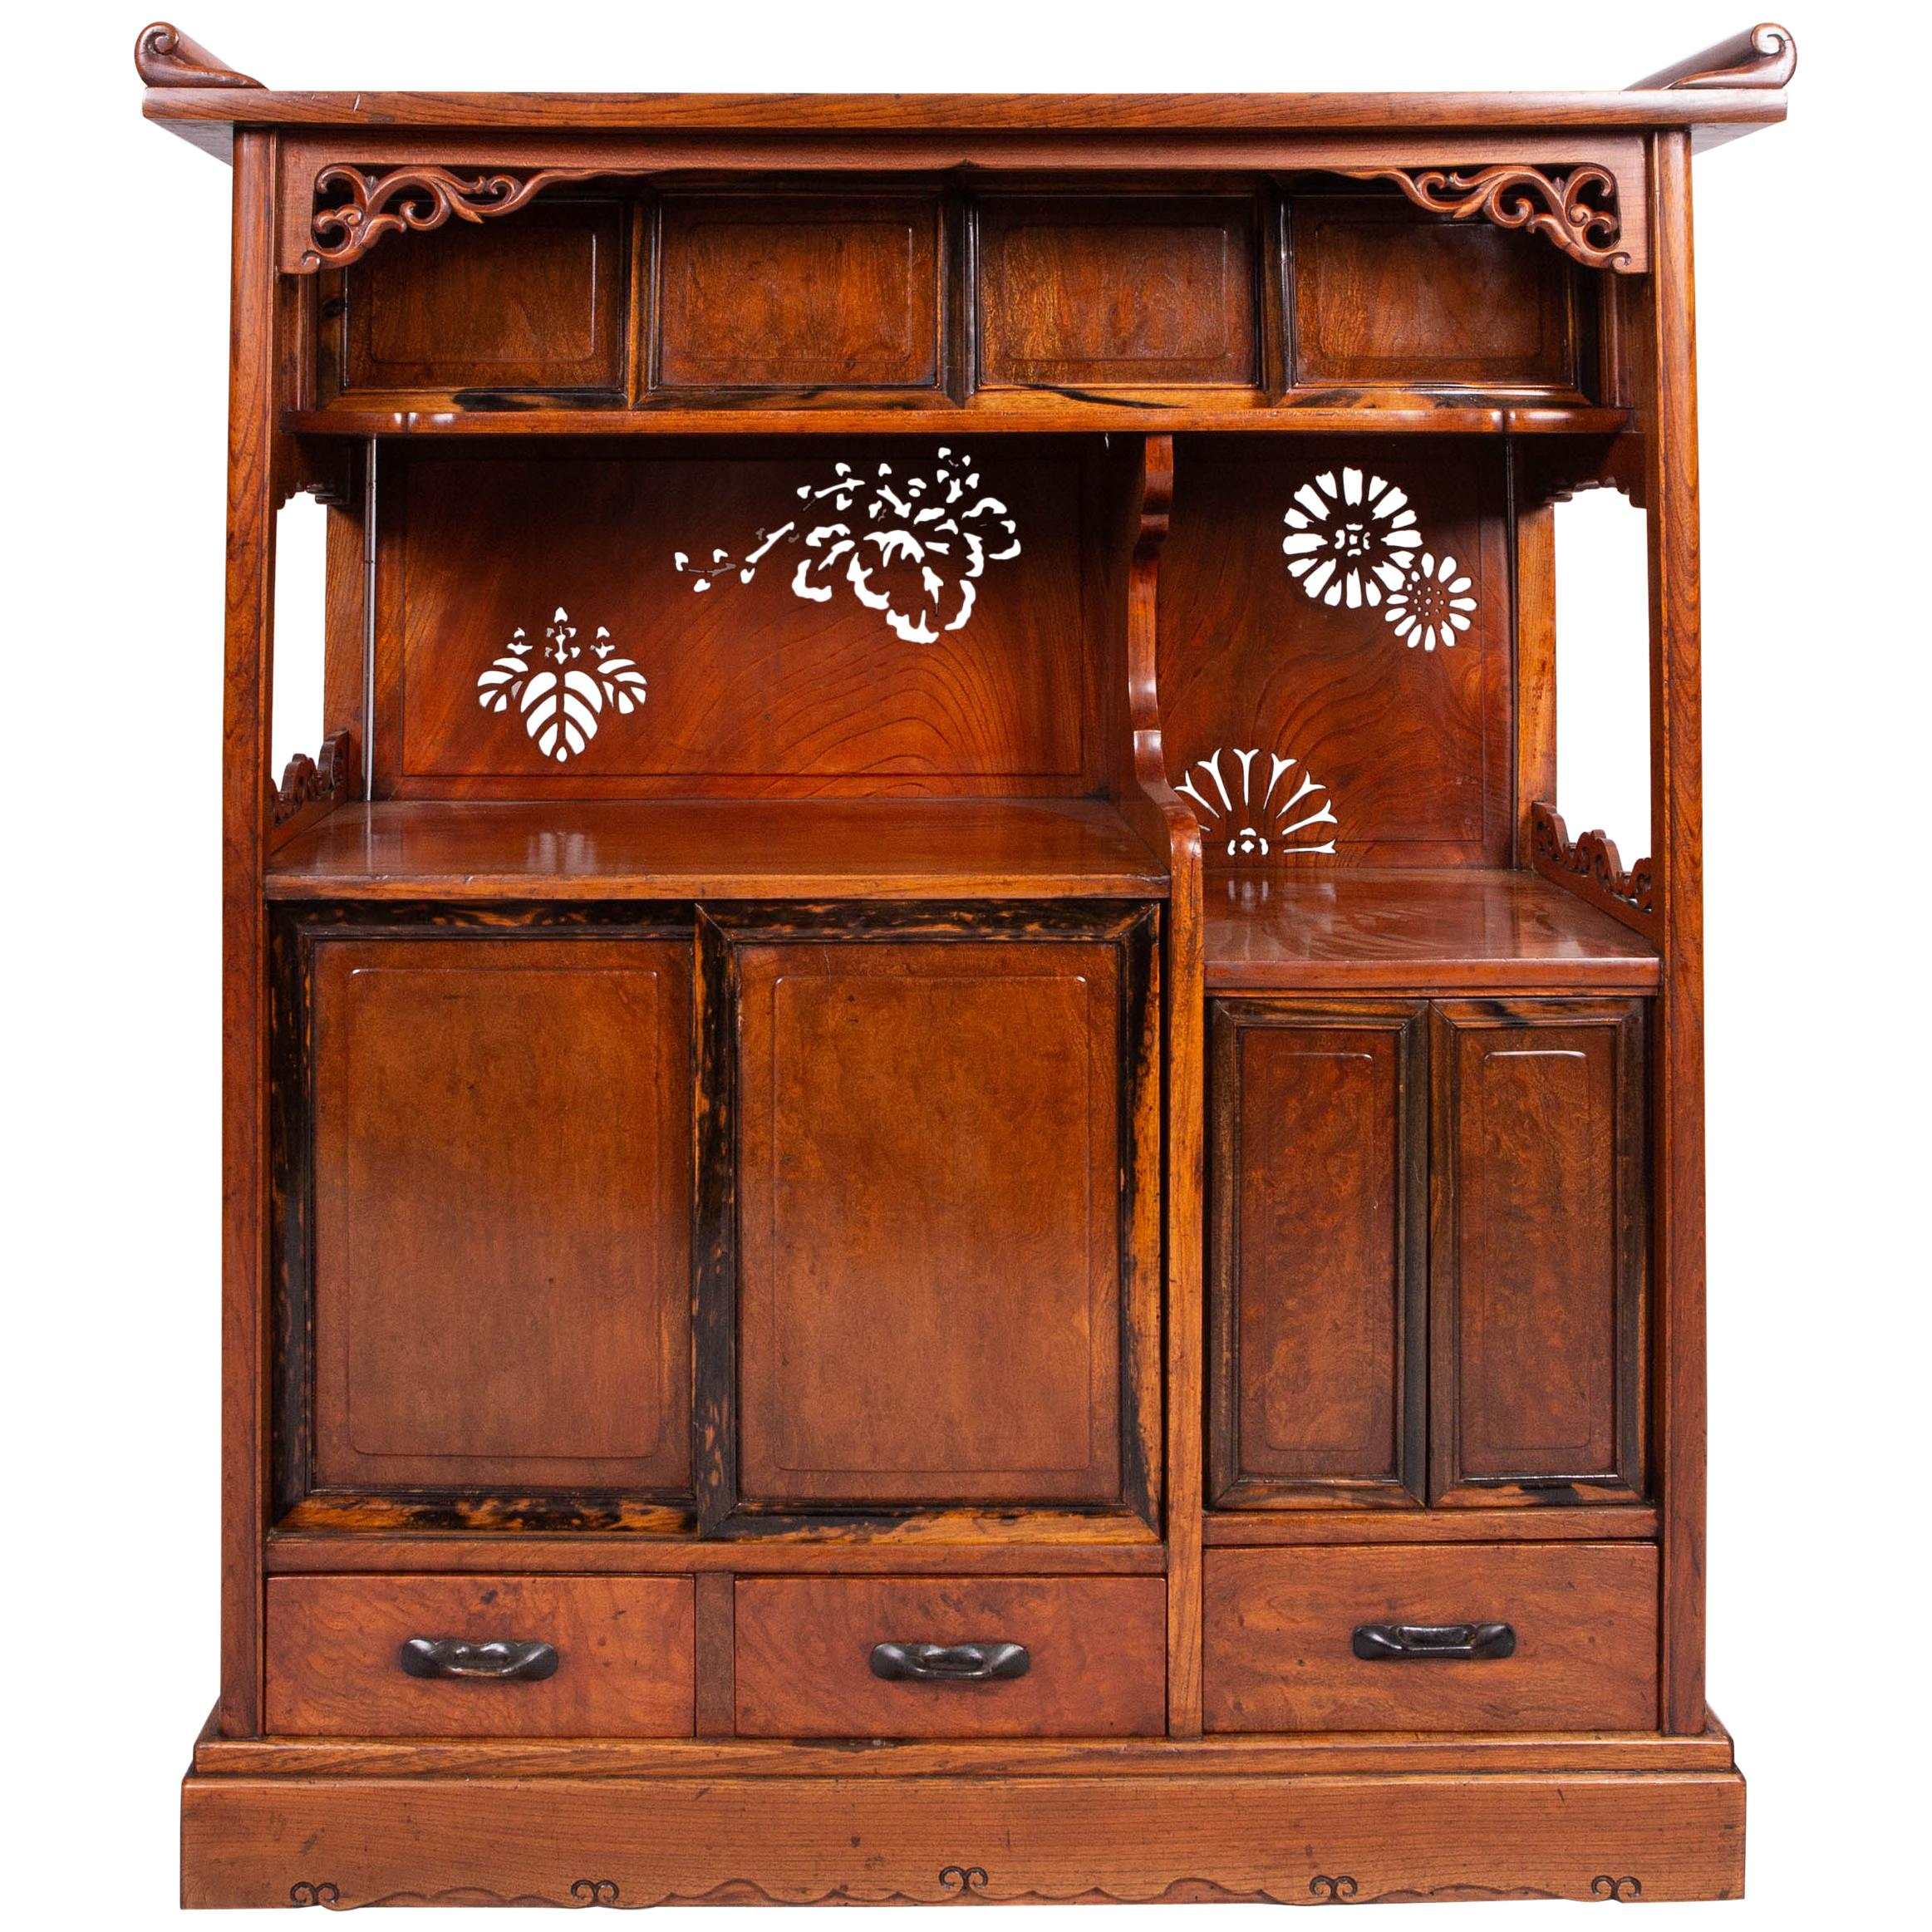 Japanese Tana 'Tea Cabinet' Made of Keyaki Wood